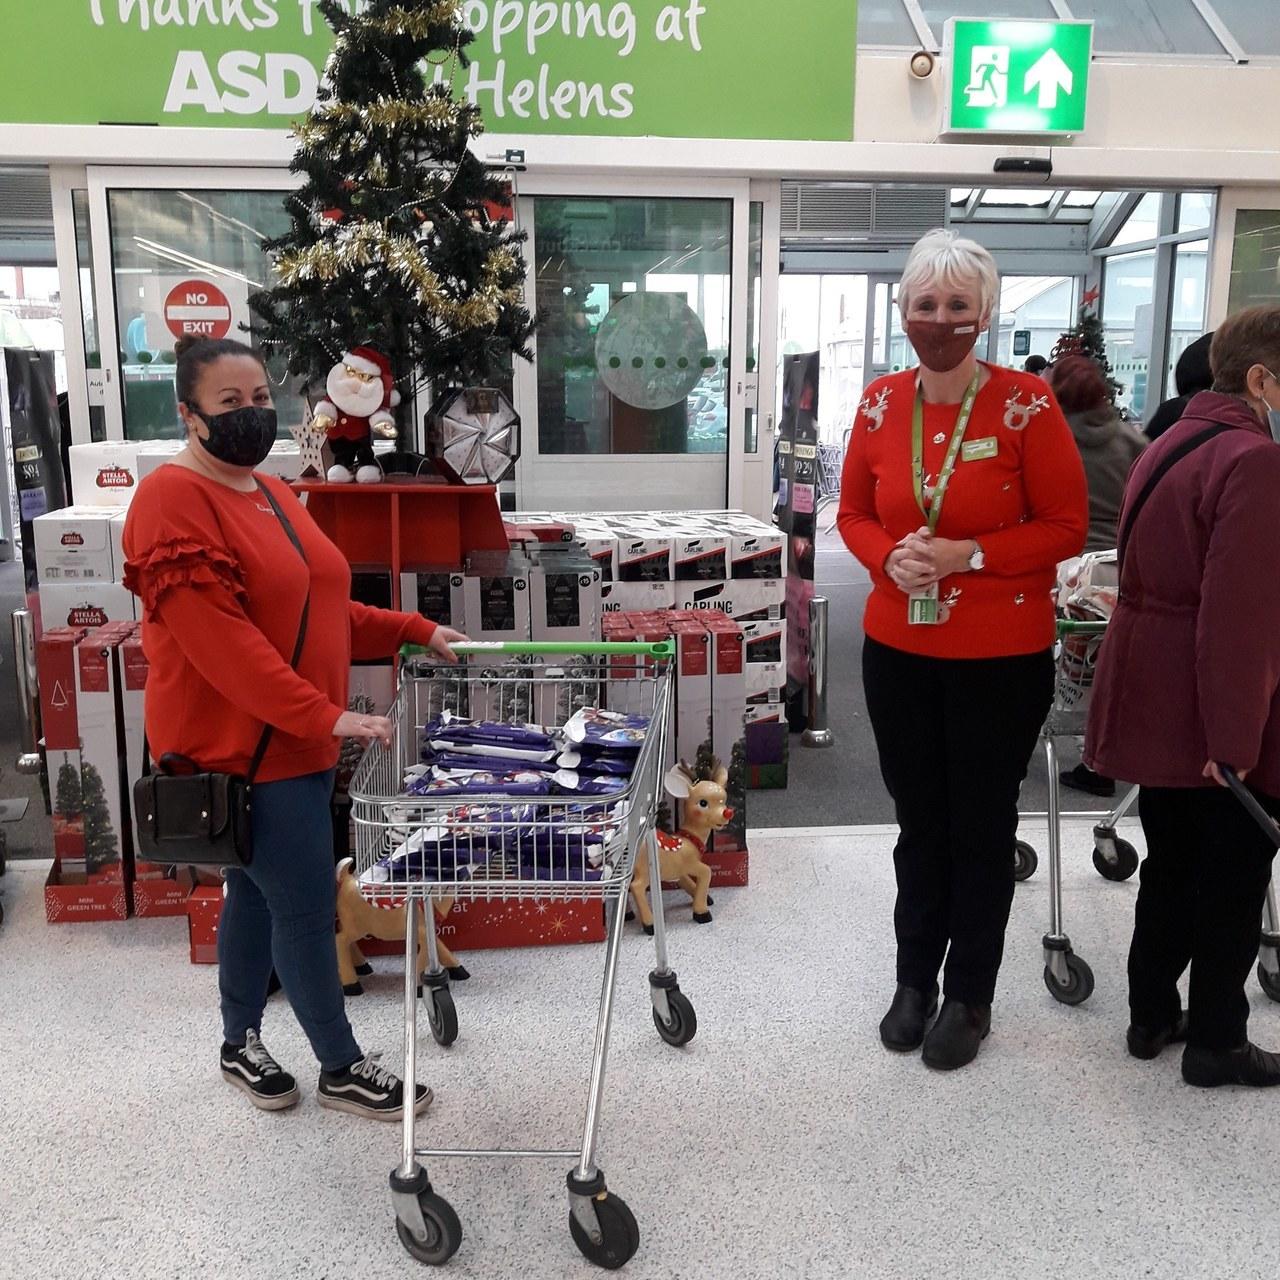 Asda St Helens donates | Asda St Helens